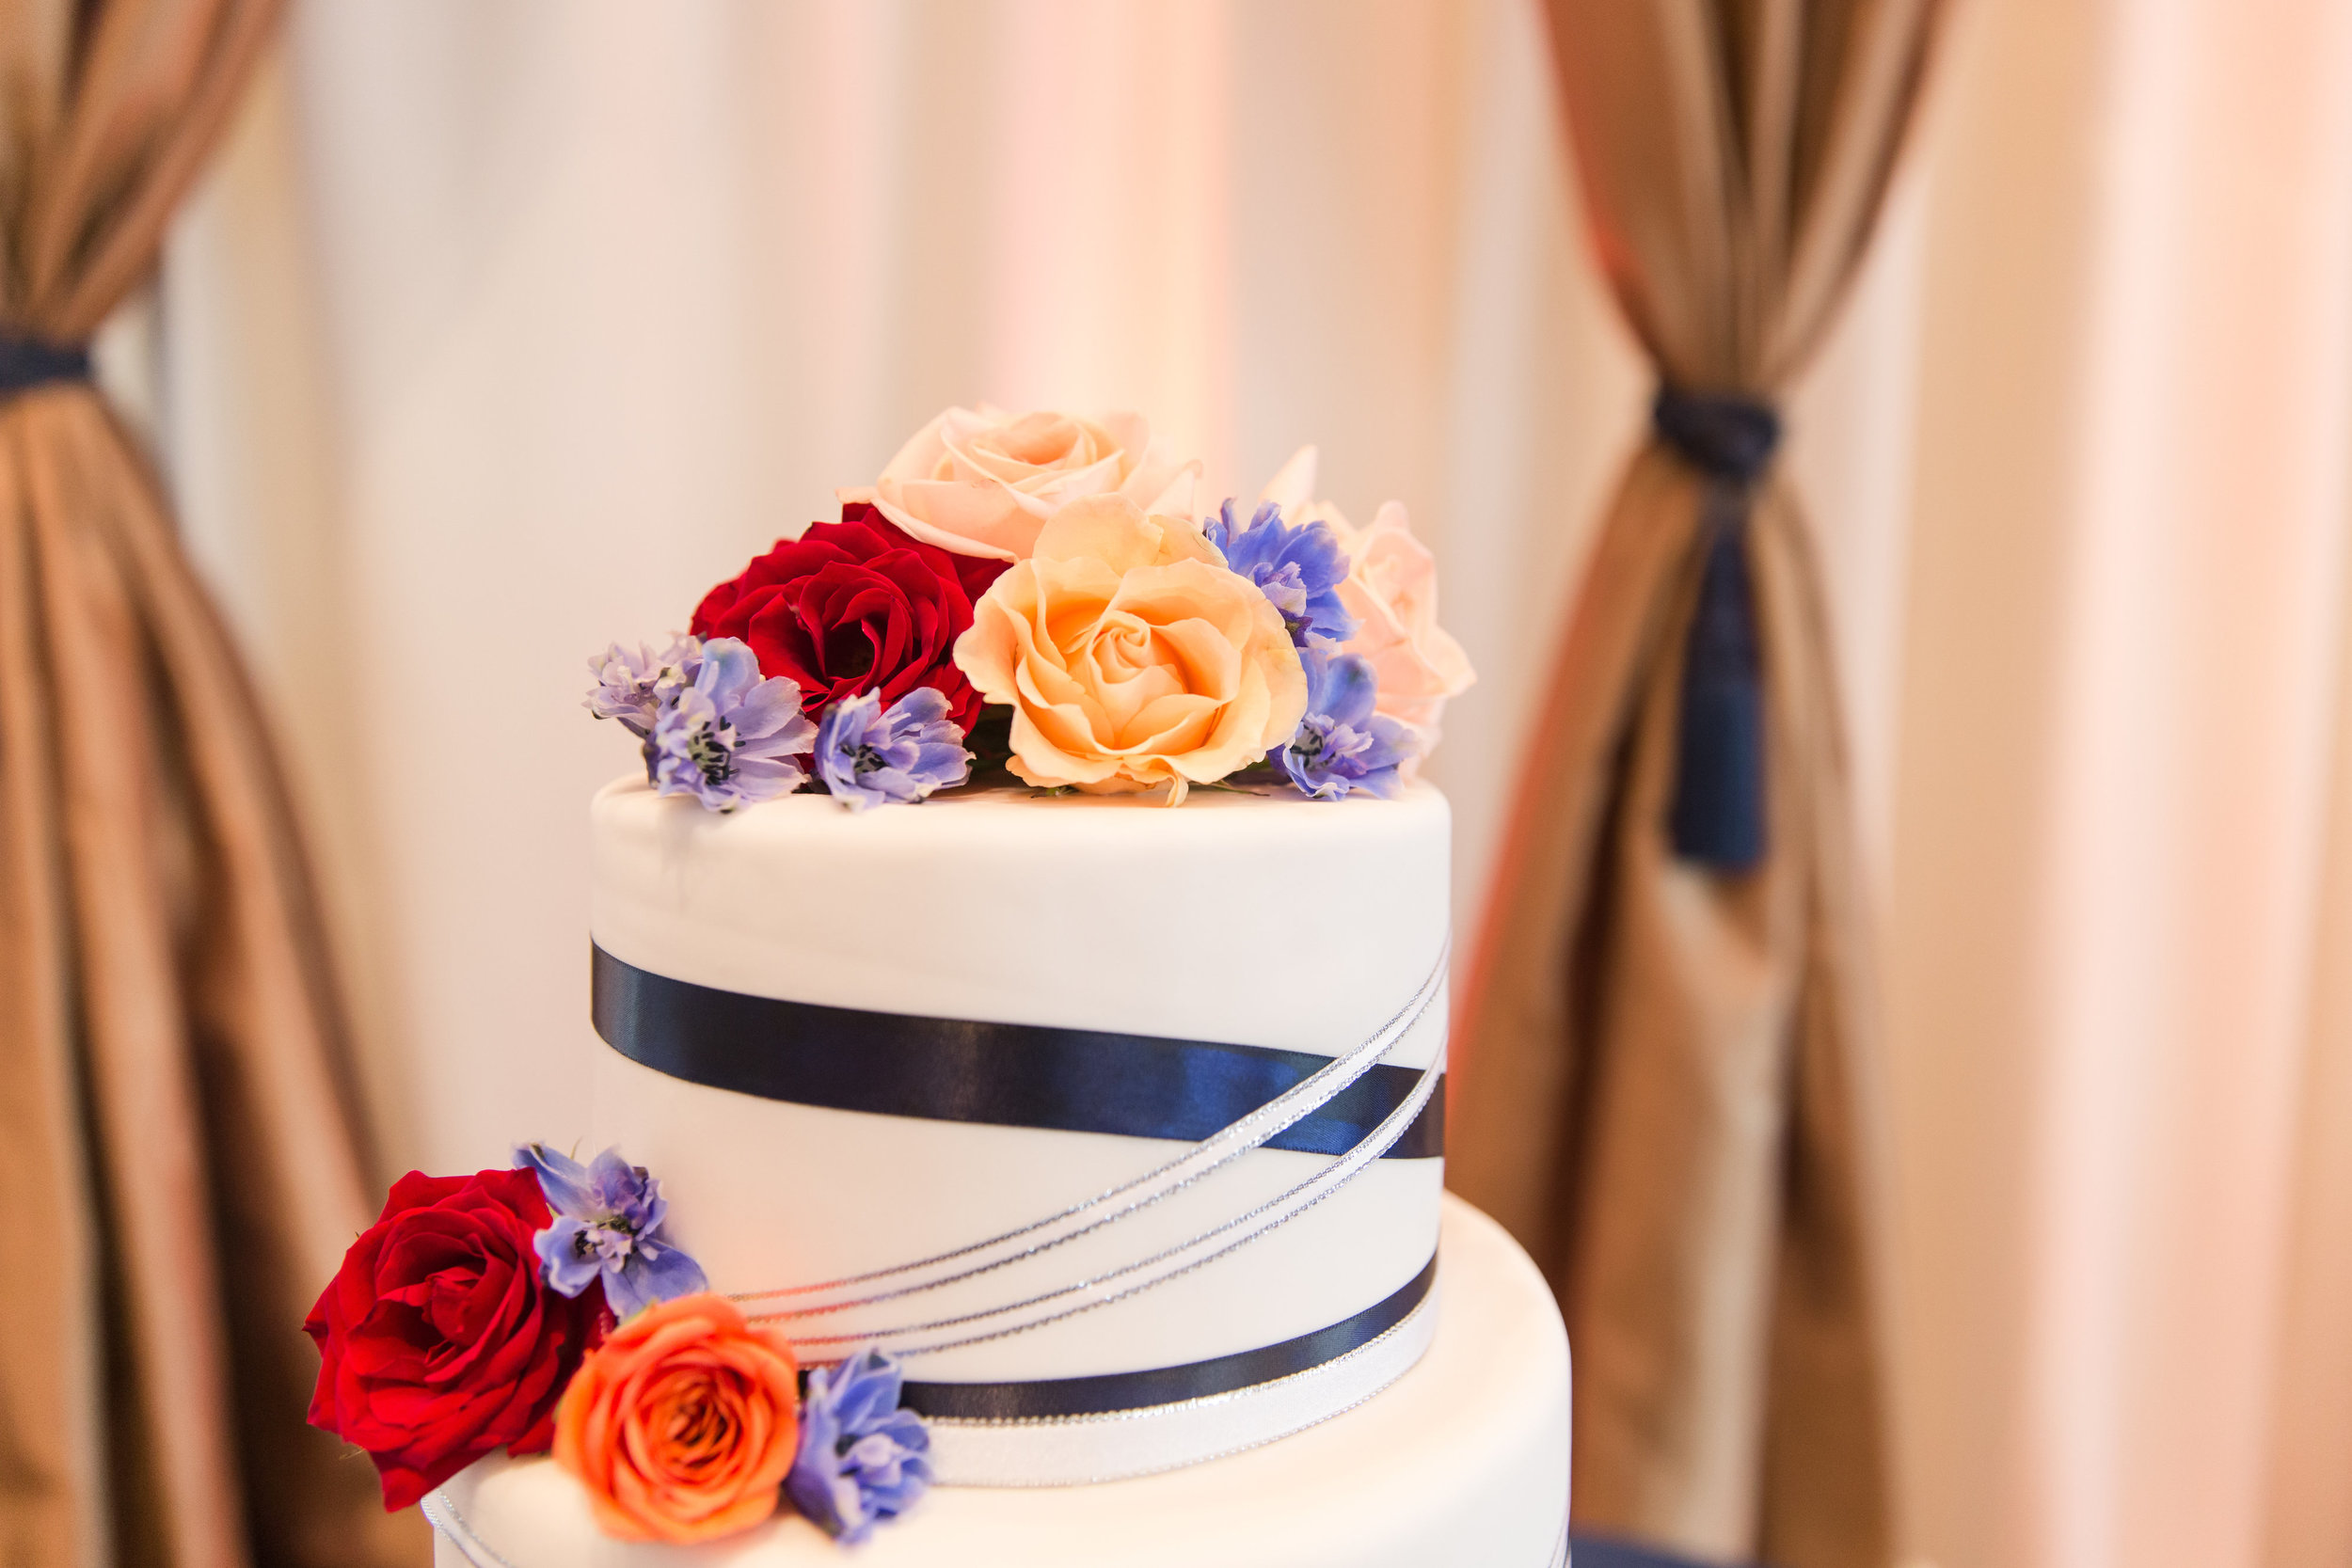 Blue and White Wedding cake - A Classic George Washington Hotel Wedding - Photography by Marirosa